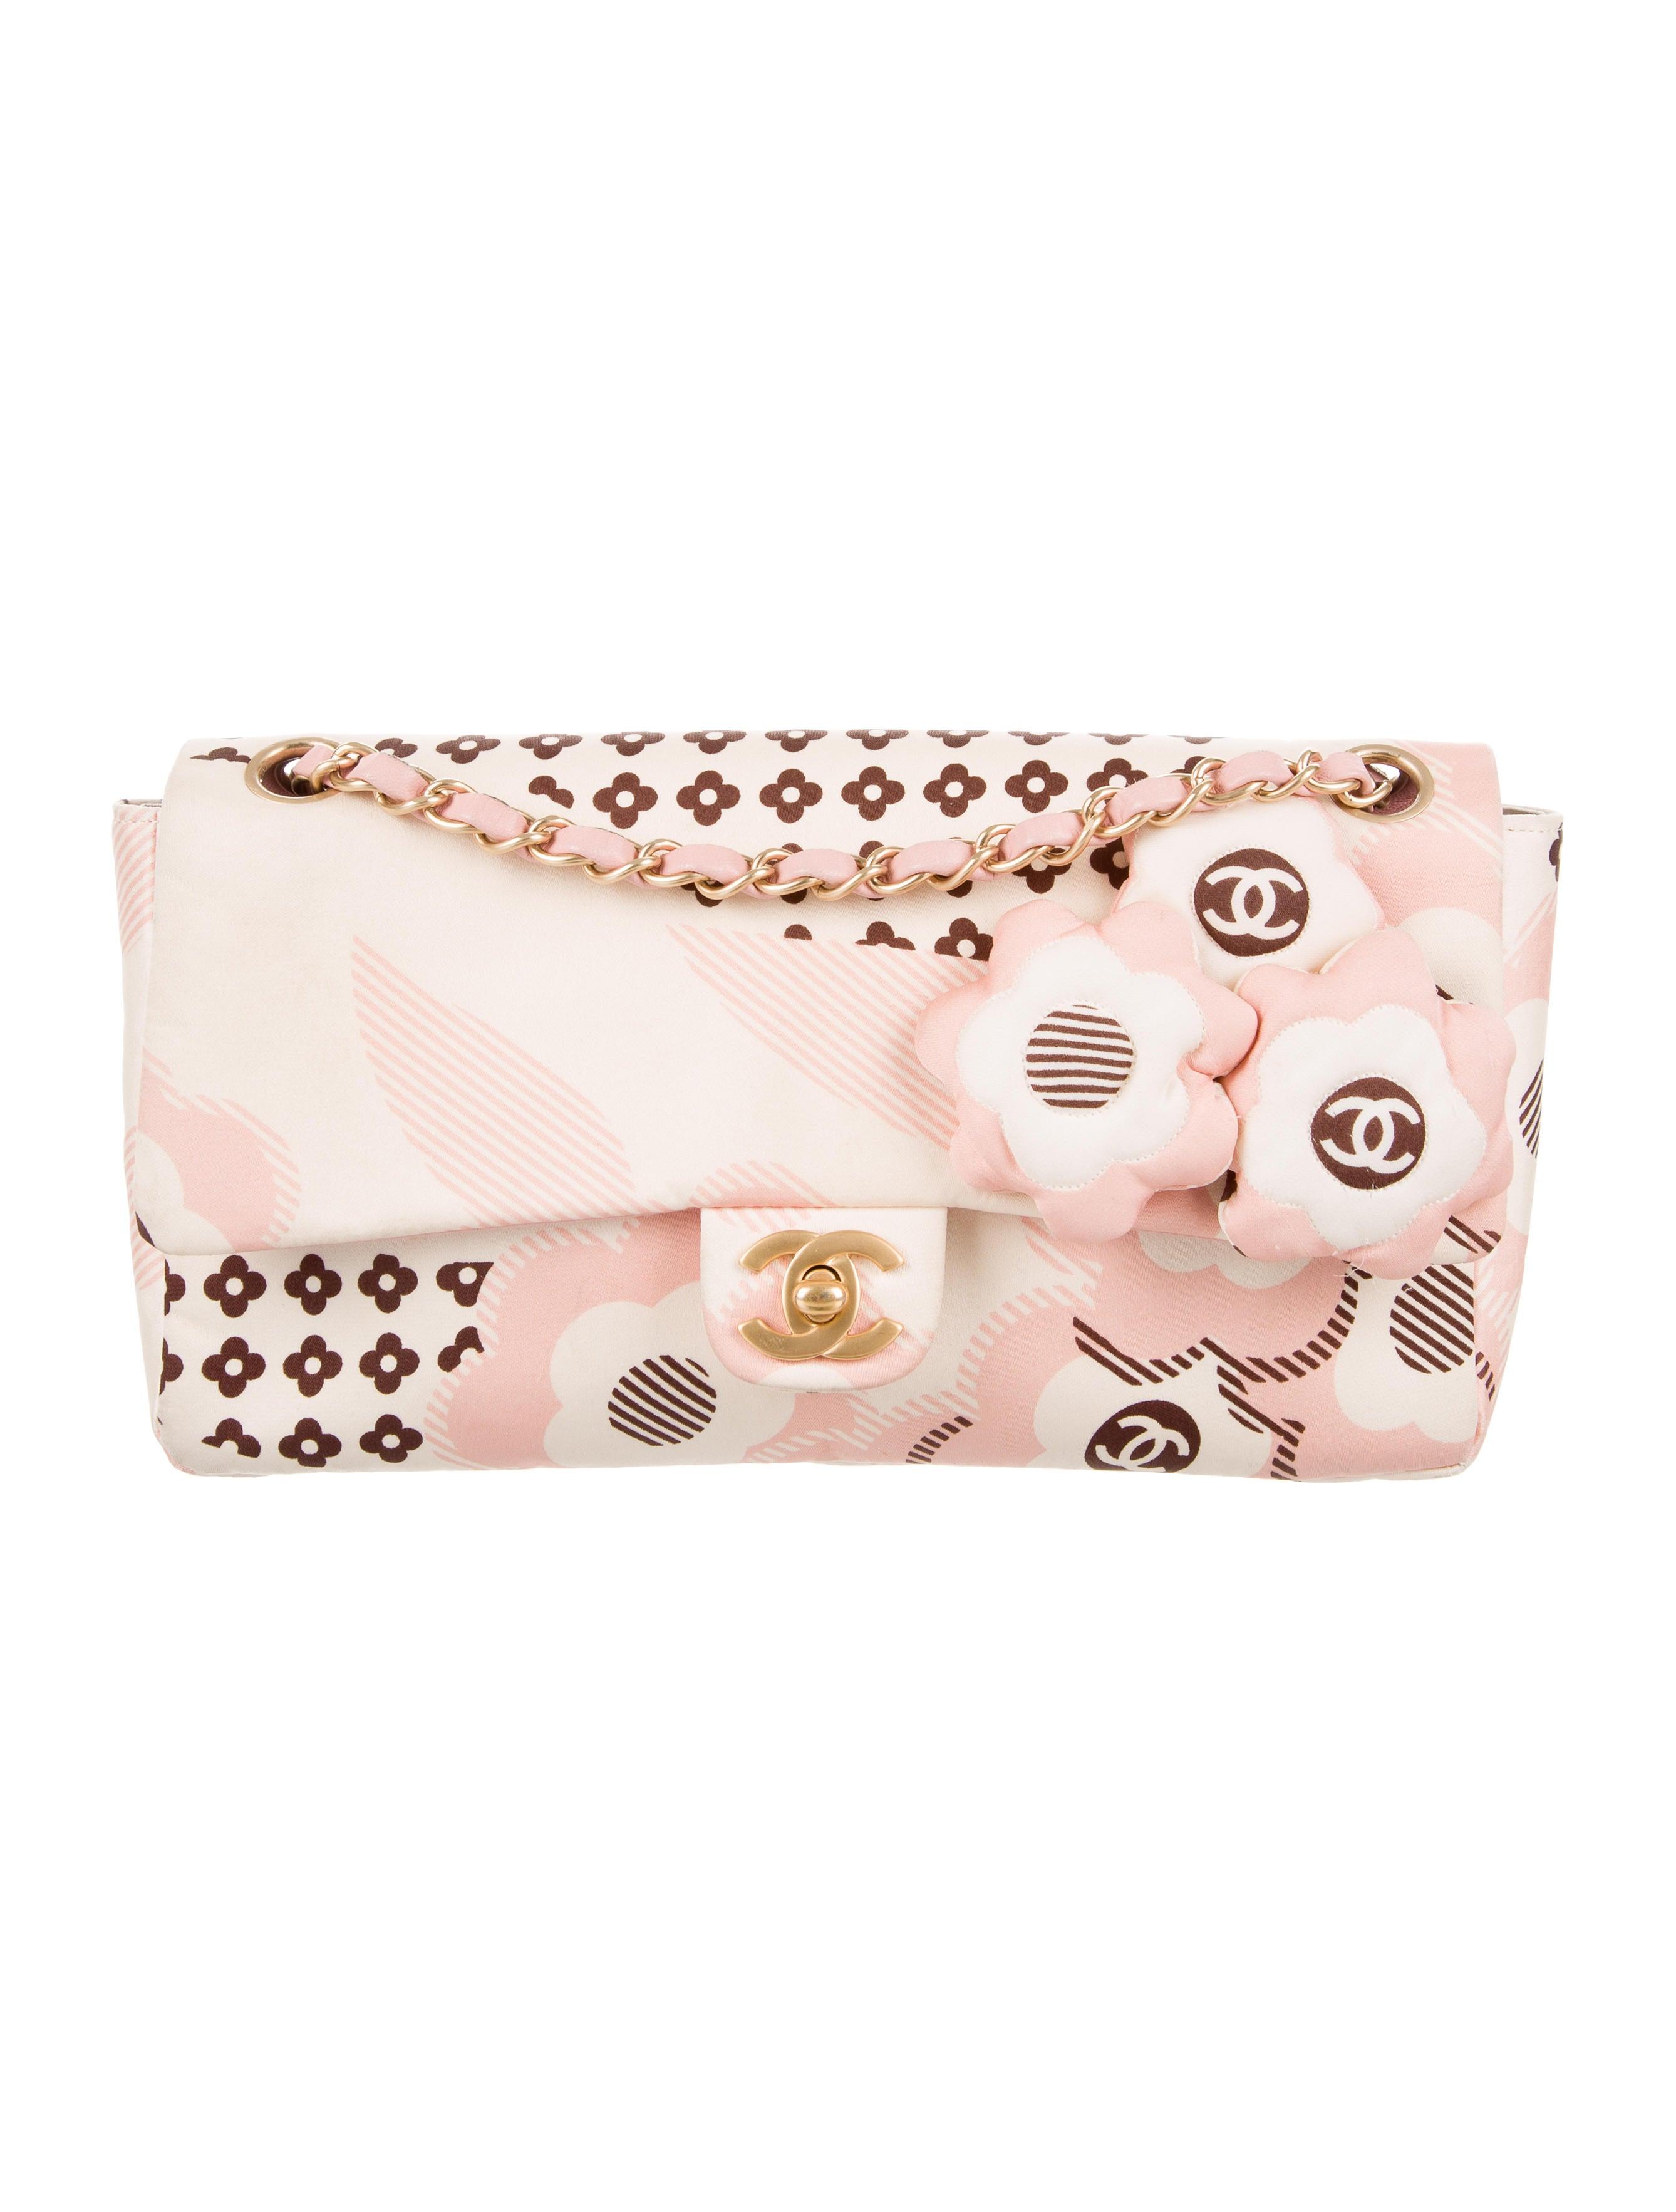 99959ad050a7 Chanel Satin Camellia Flap Bag - Handbags - CHA217889